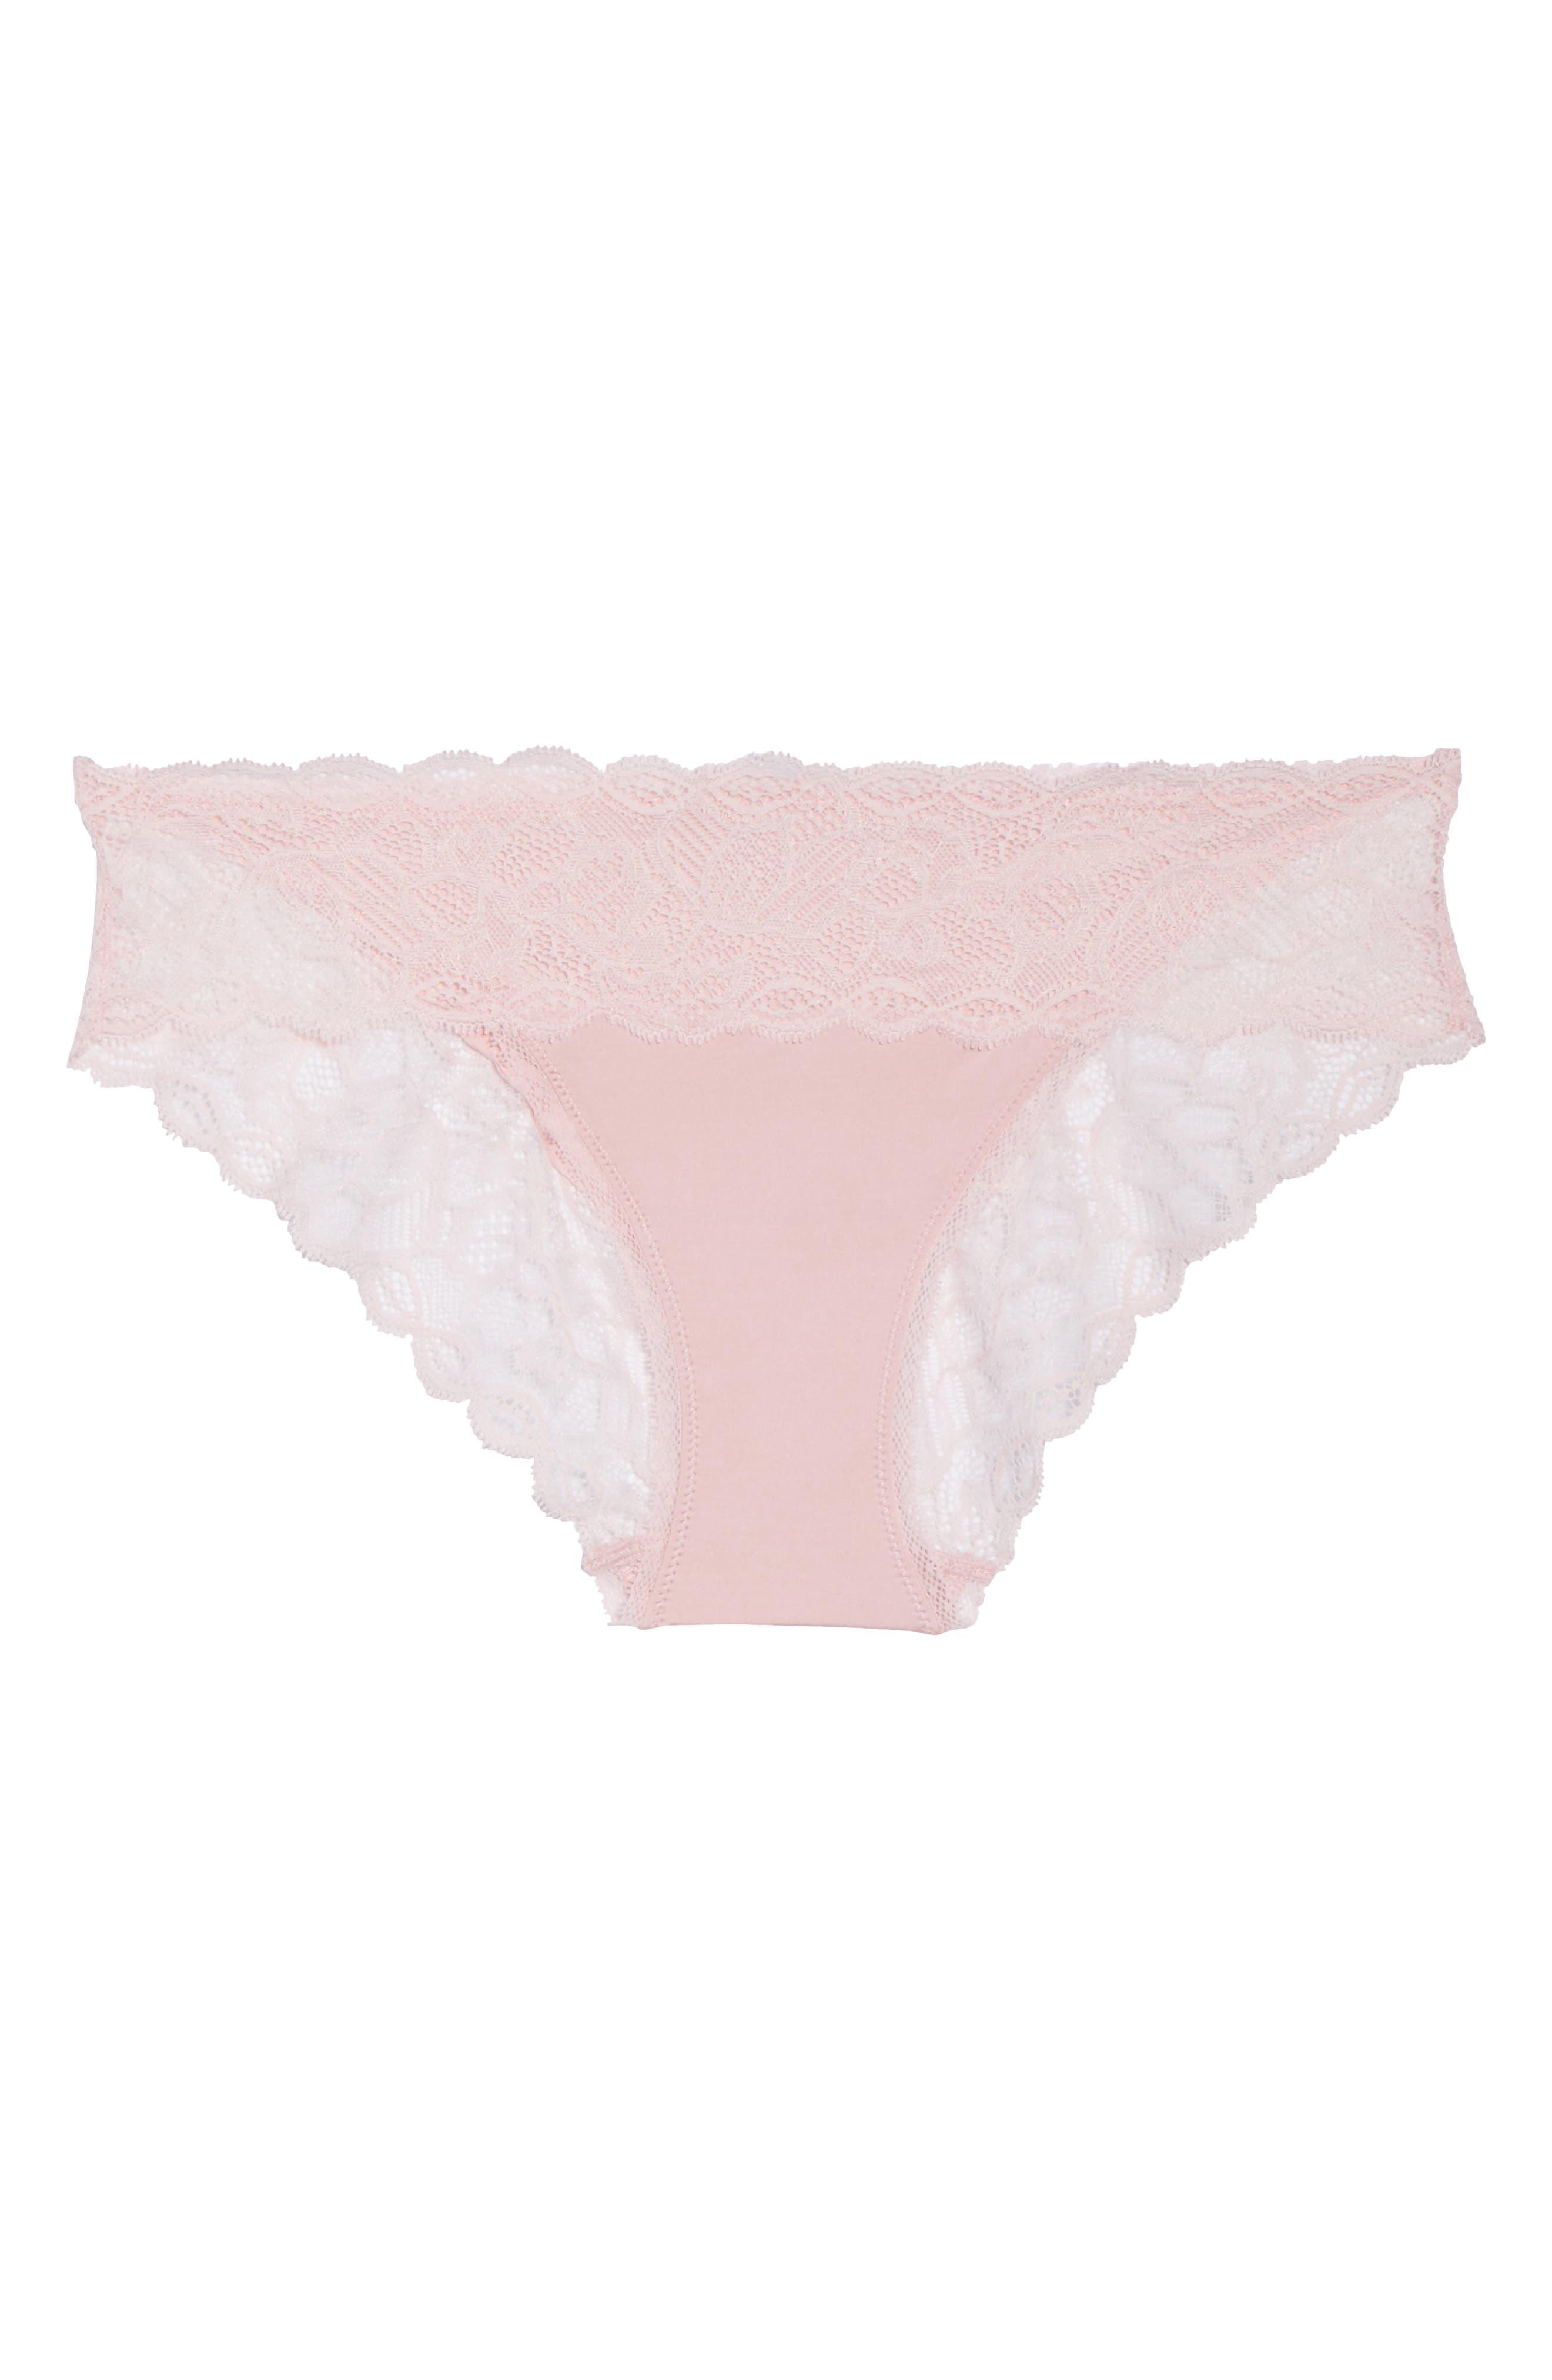 Seductive Comfort Lace Bikini,                             Alternate thumbnail 4, color,                             Attract